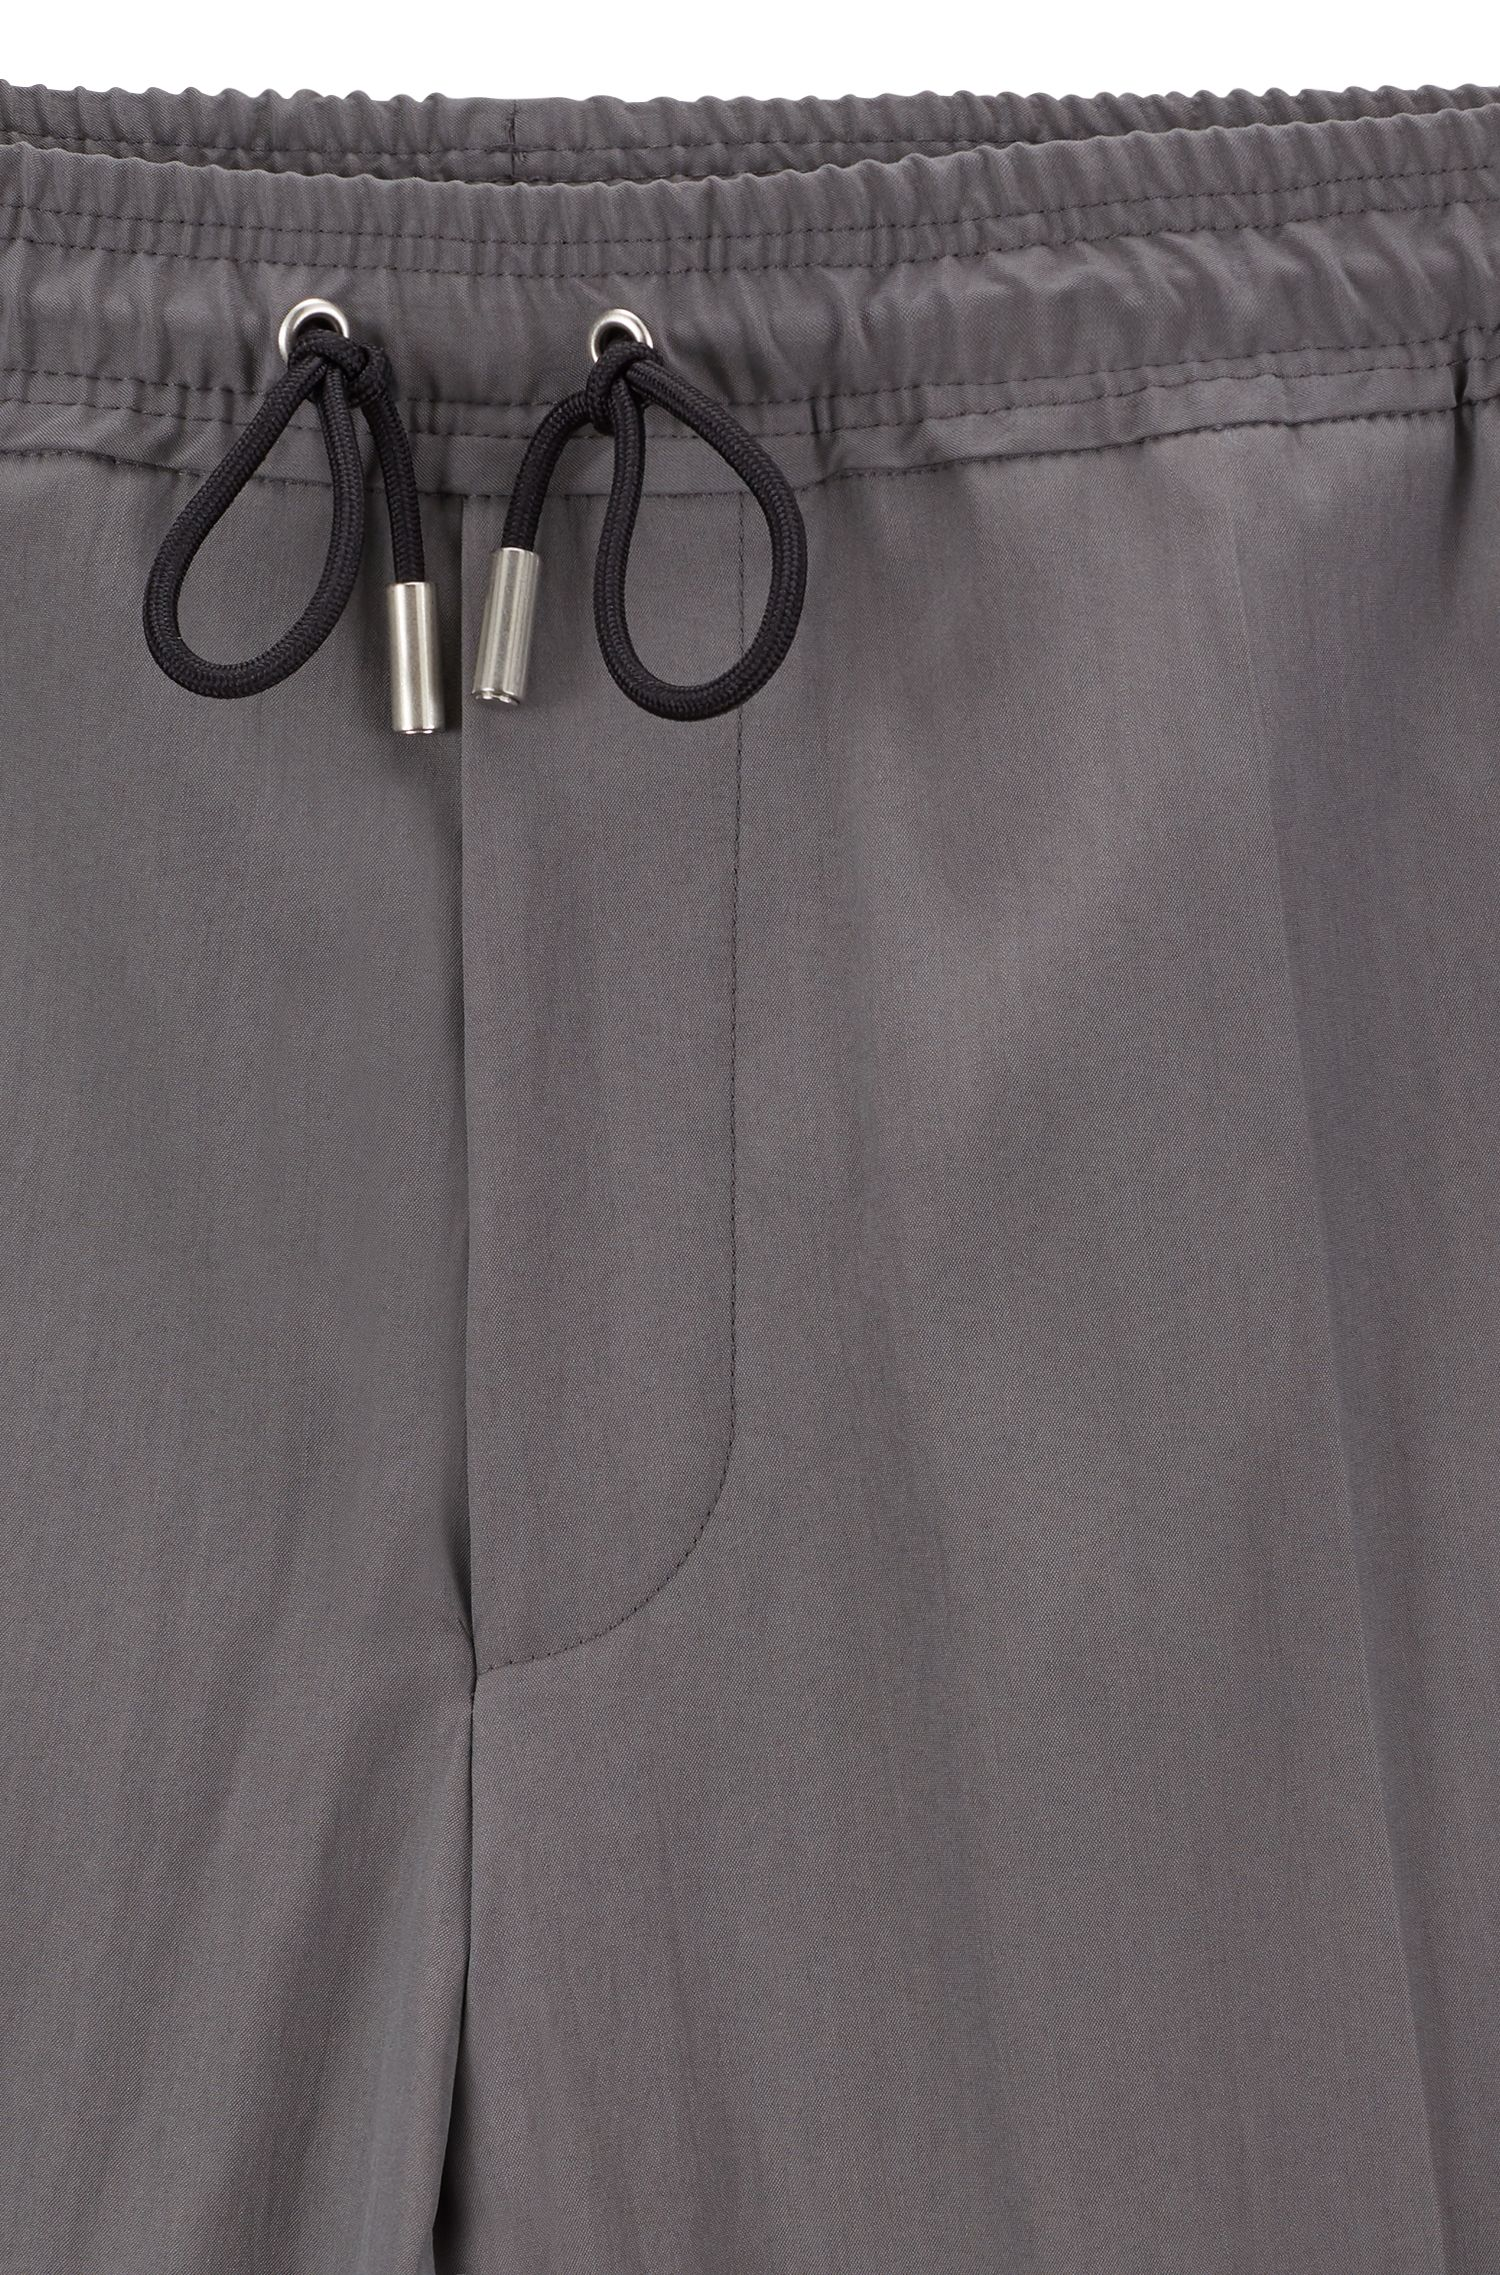 Fashion Show drawstring pants in a virgin-wool blend, Grey